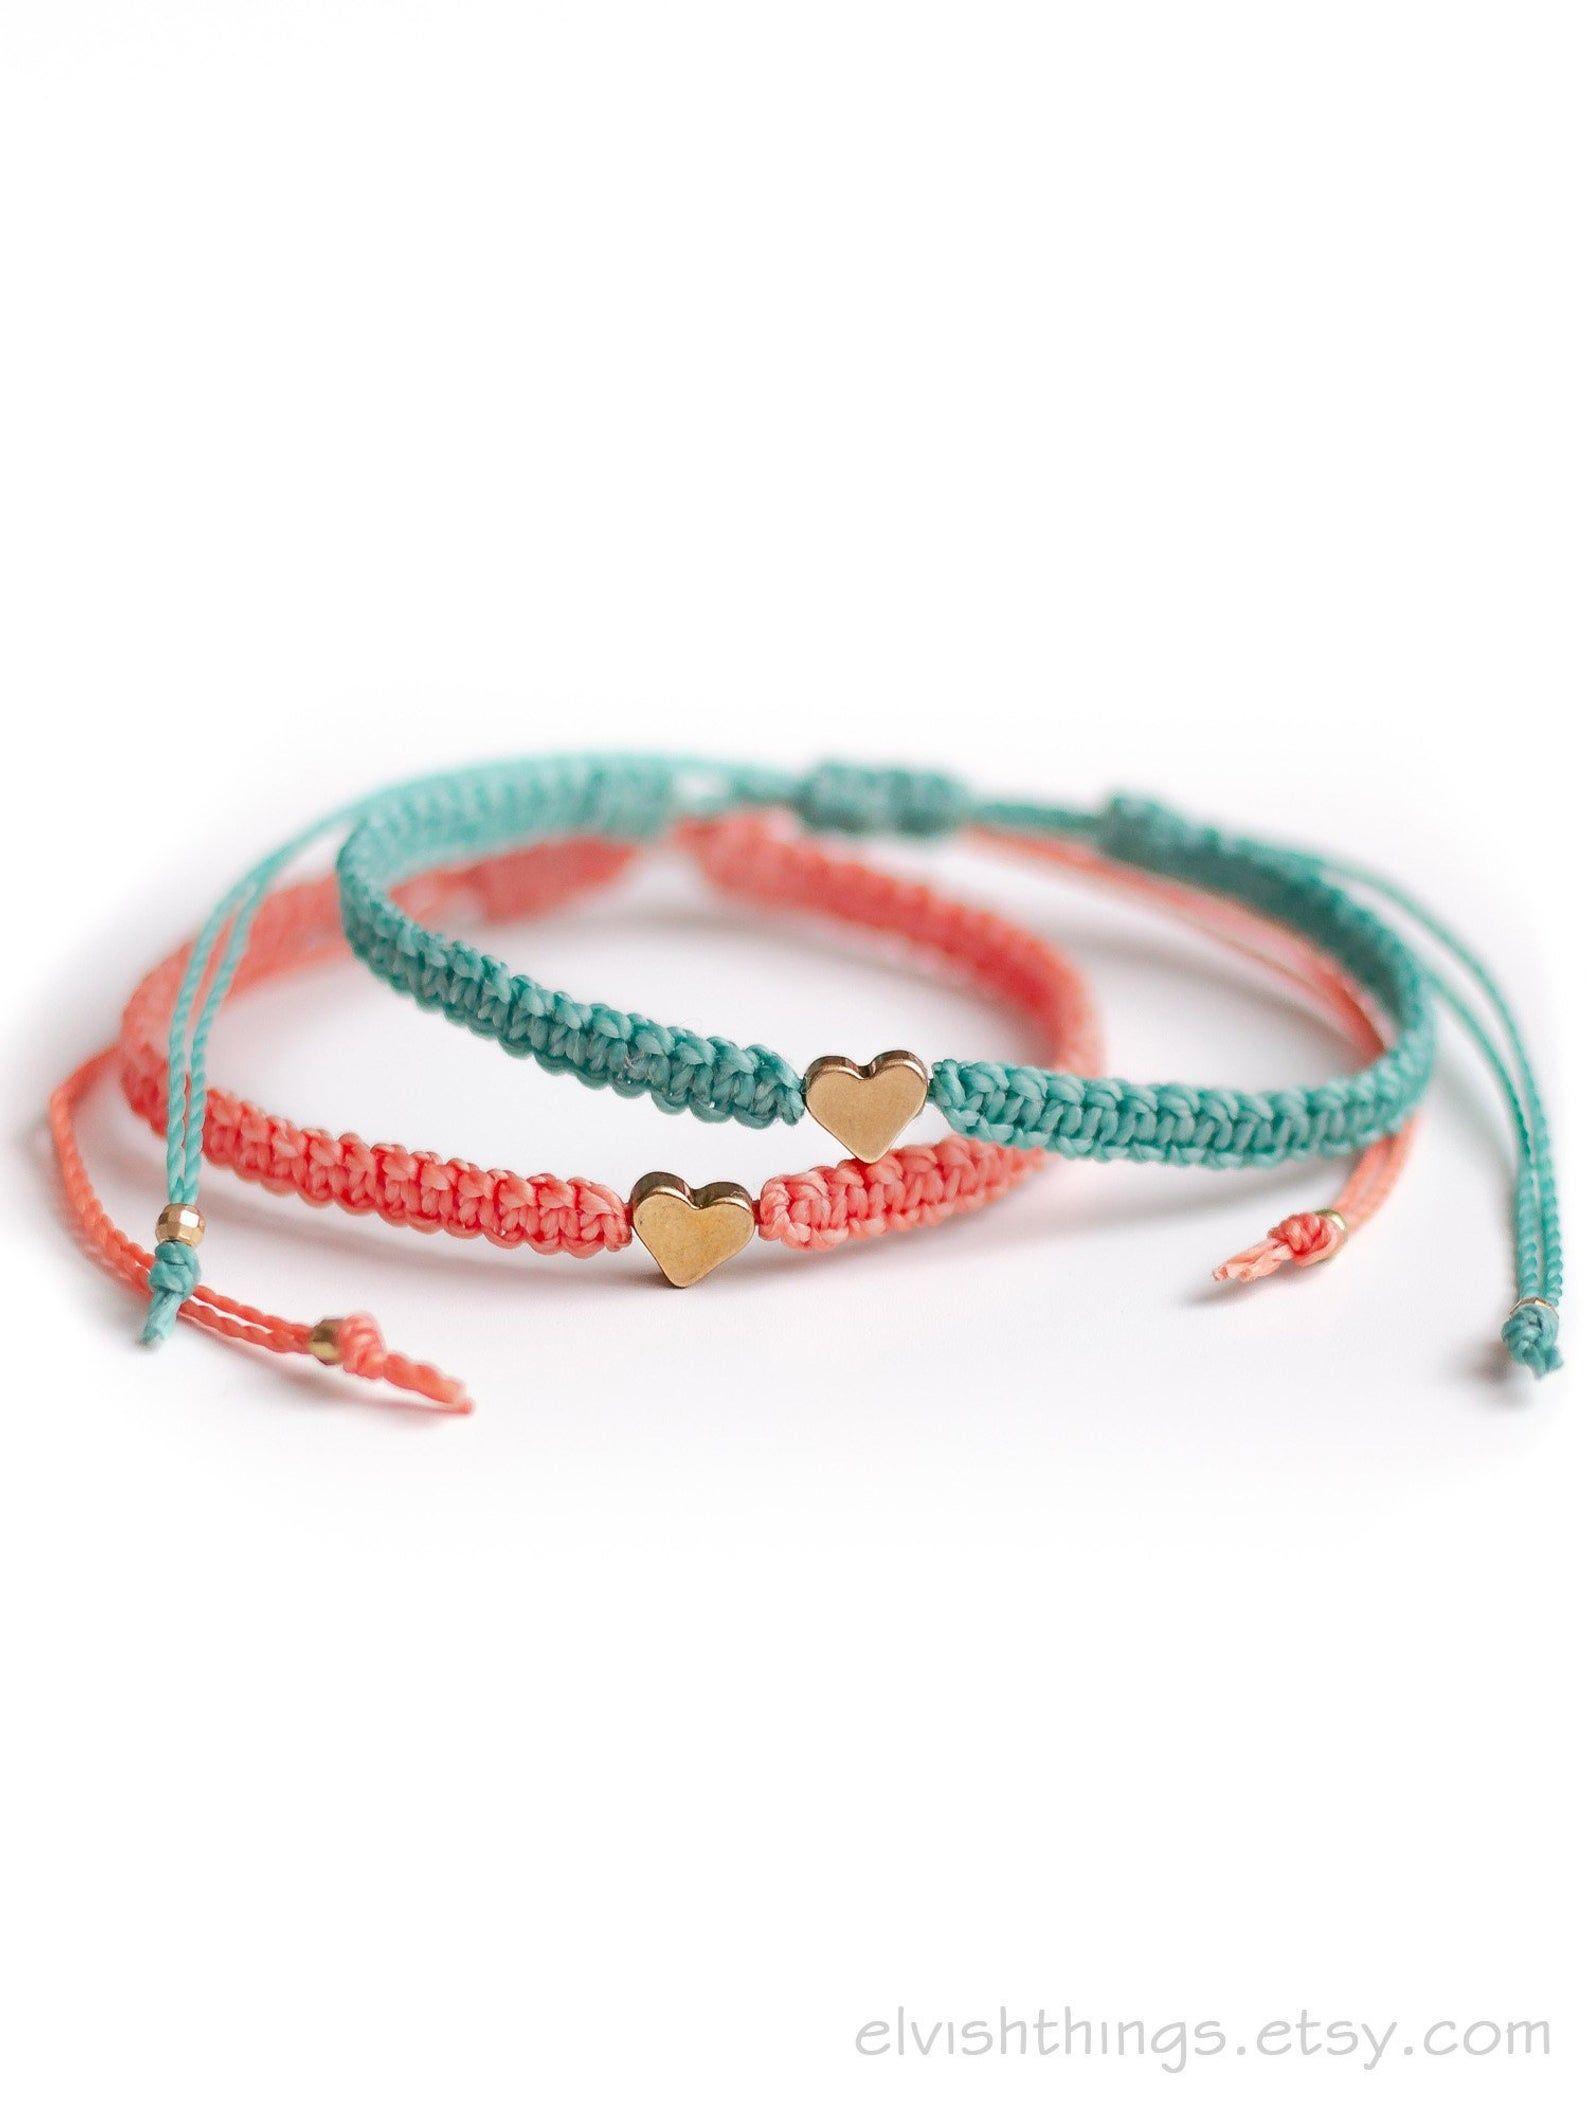 set of 2 Matching couple bracelets Heart bracelets His and her bracelets Long distance relationship bracelet Macrame bracelet